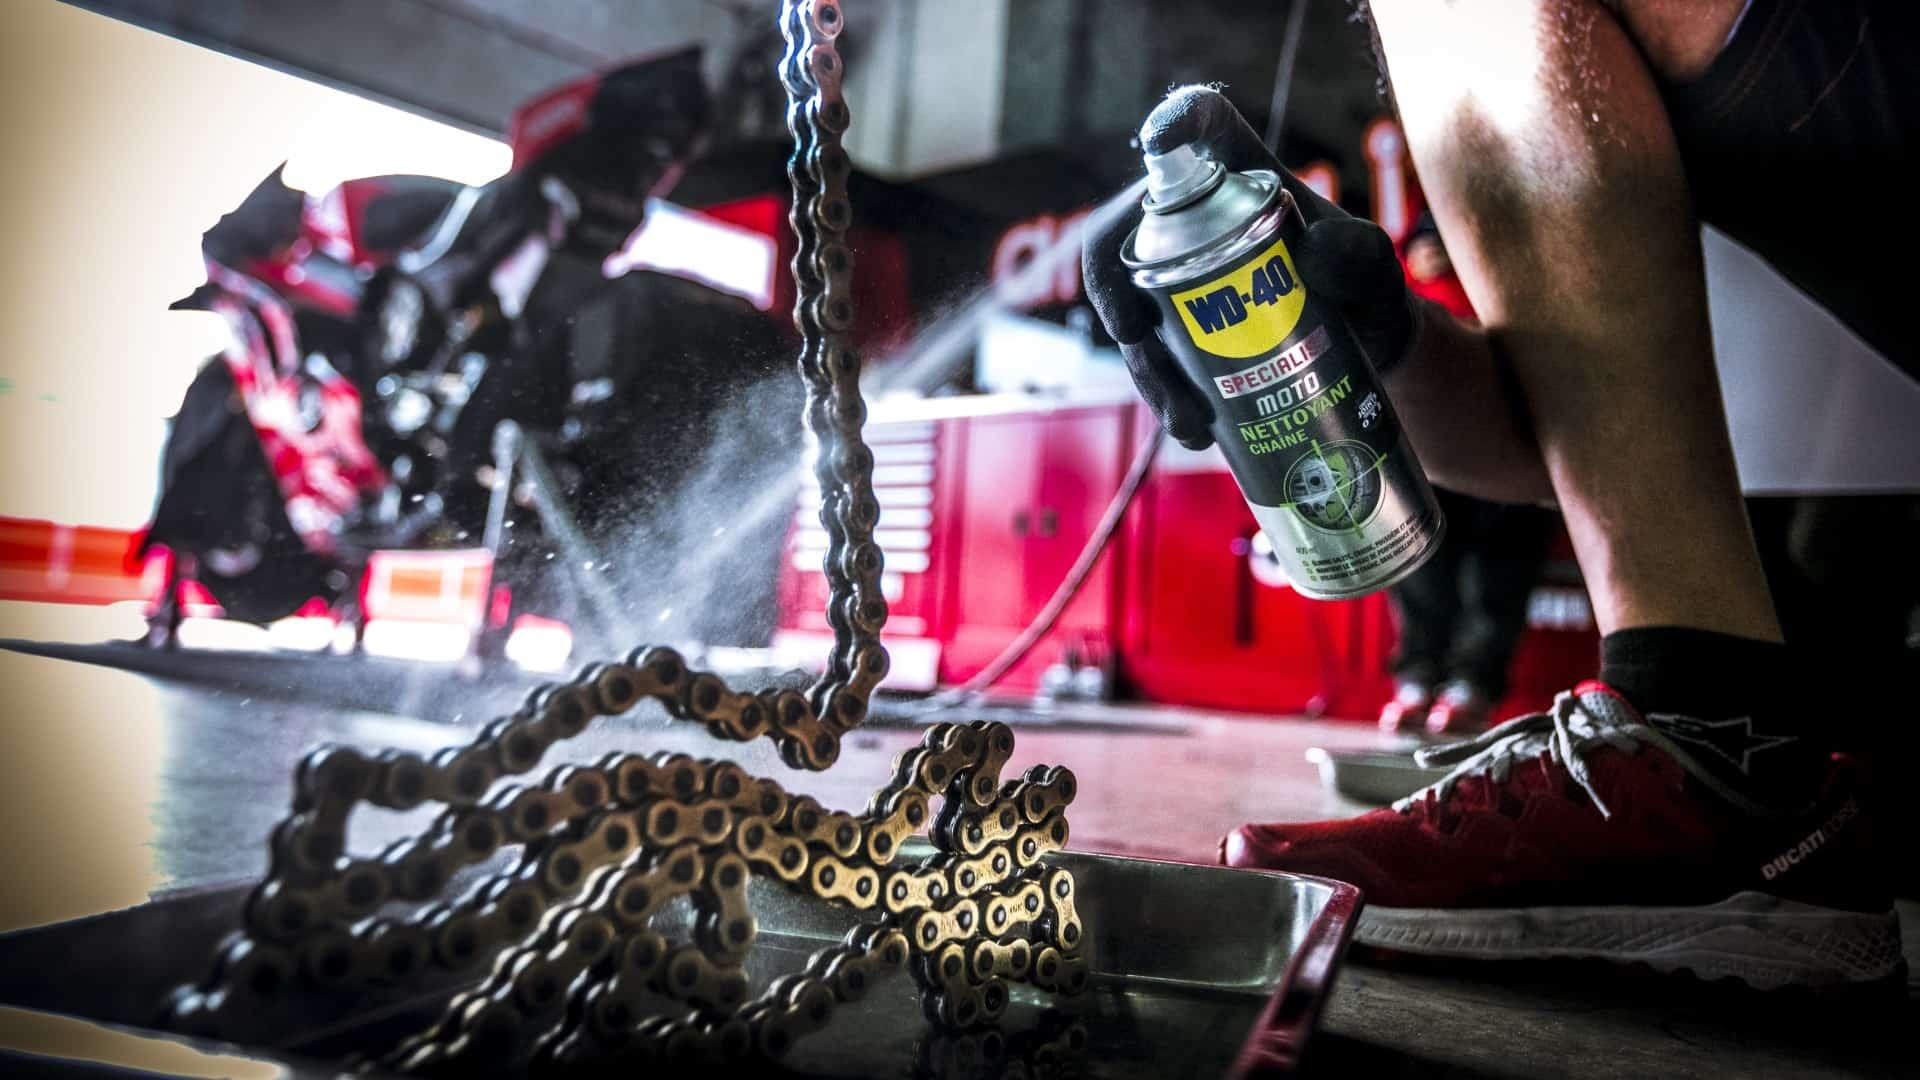 motorradkette reinigen - lubrification des chaînes de moto